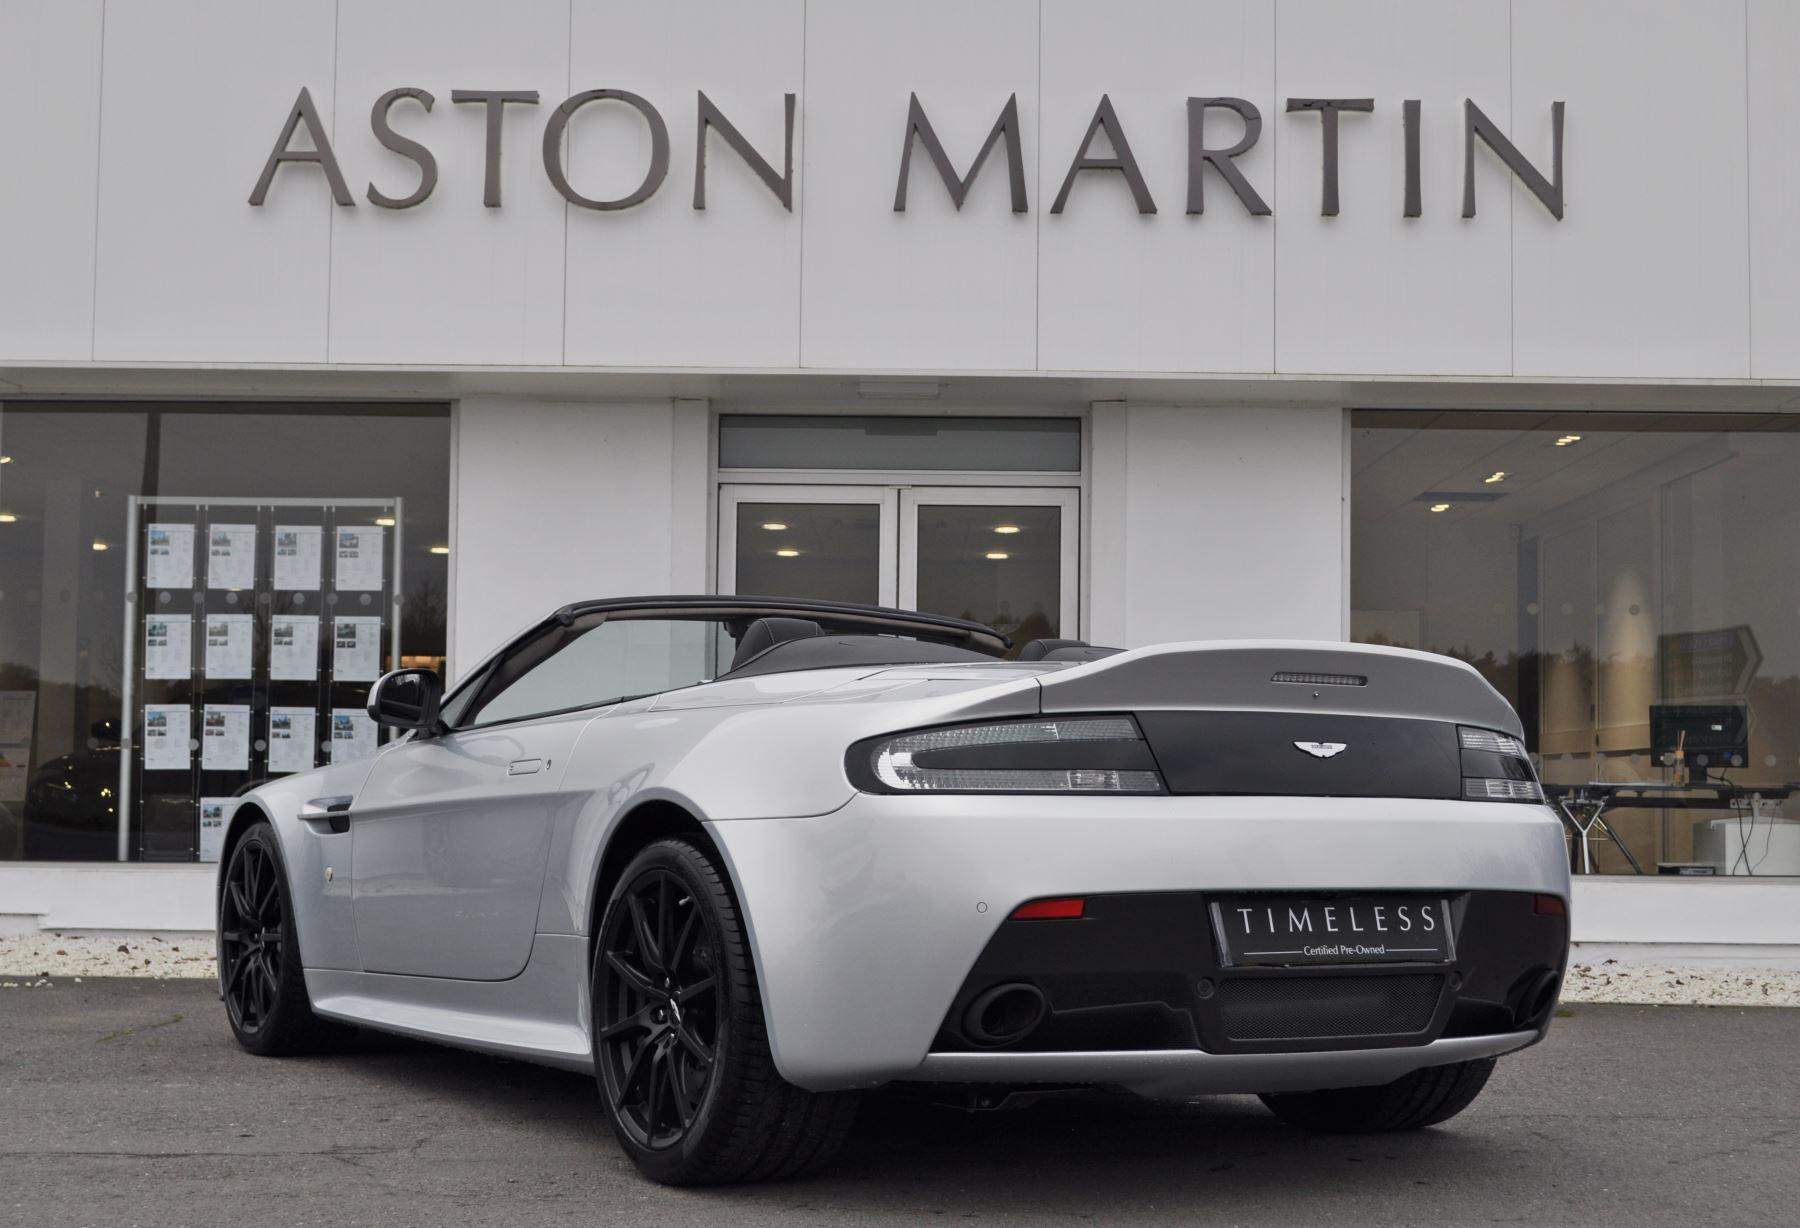 Aston Martin V12 Vantage S S 2dr Sportshift III image 4